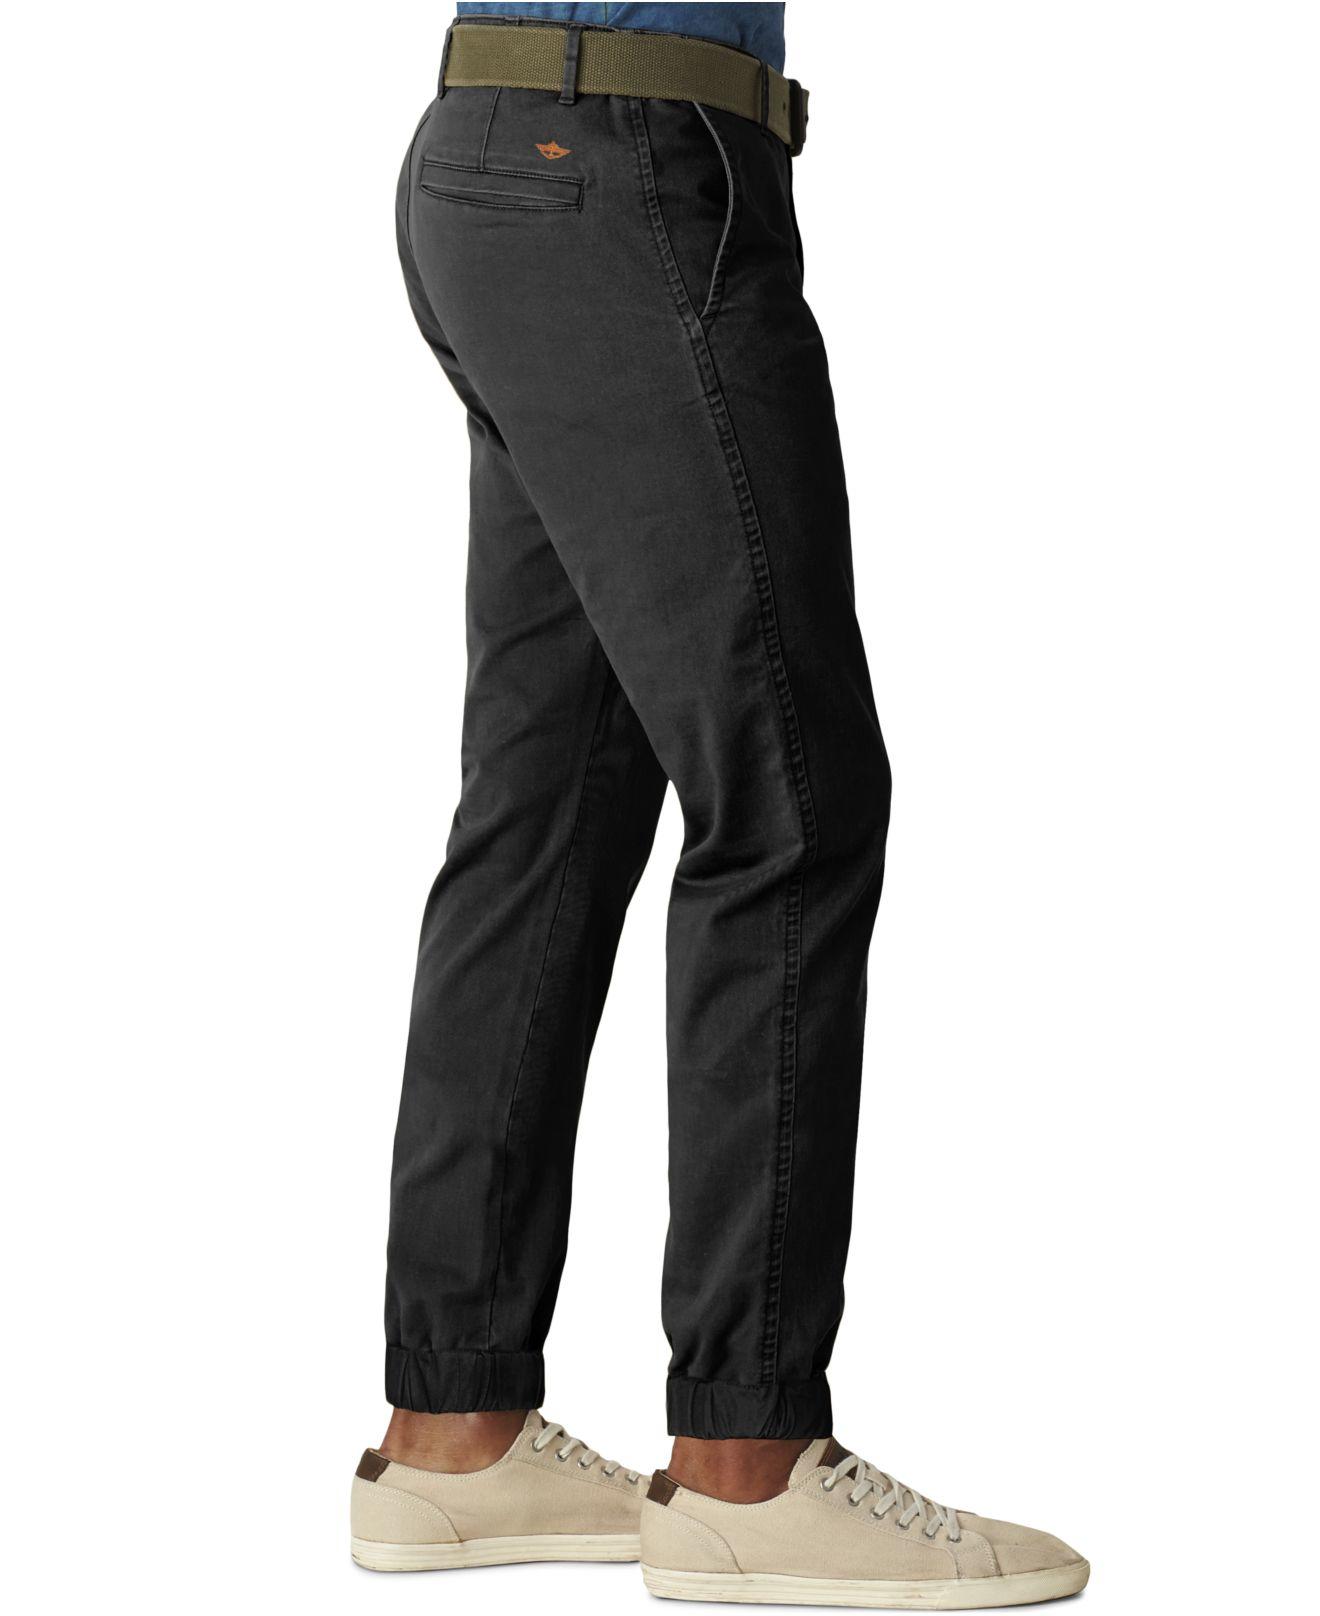 Lyst Dockers Alpha Slim Fit Jogger Pants In Black For Men